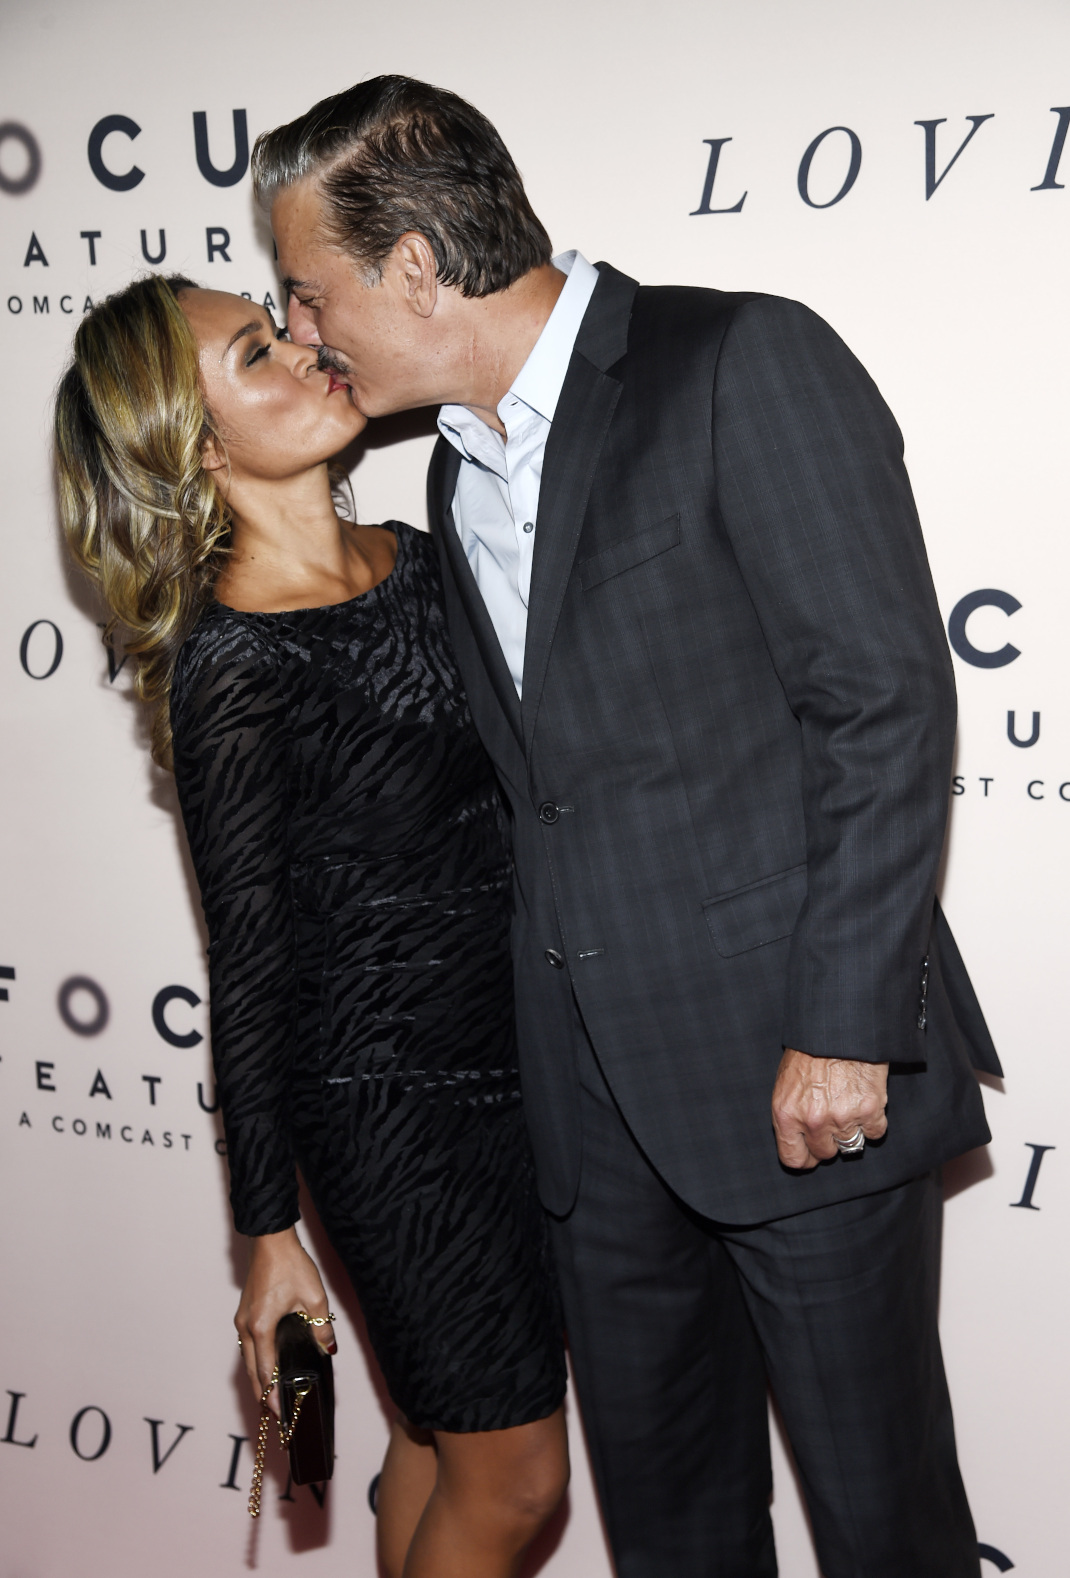 O Κρις Νόρθ με την σύζυγό του Τάρα Γουίλσον